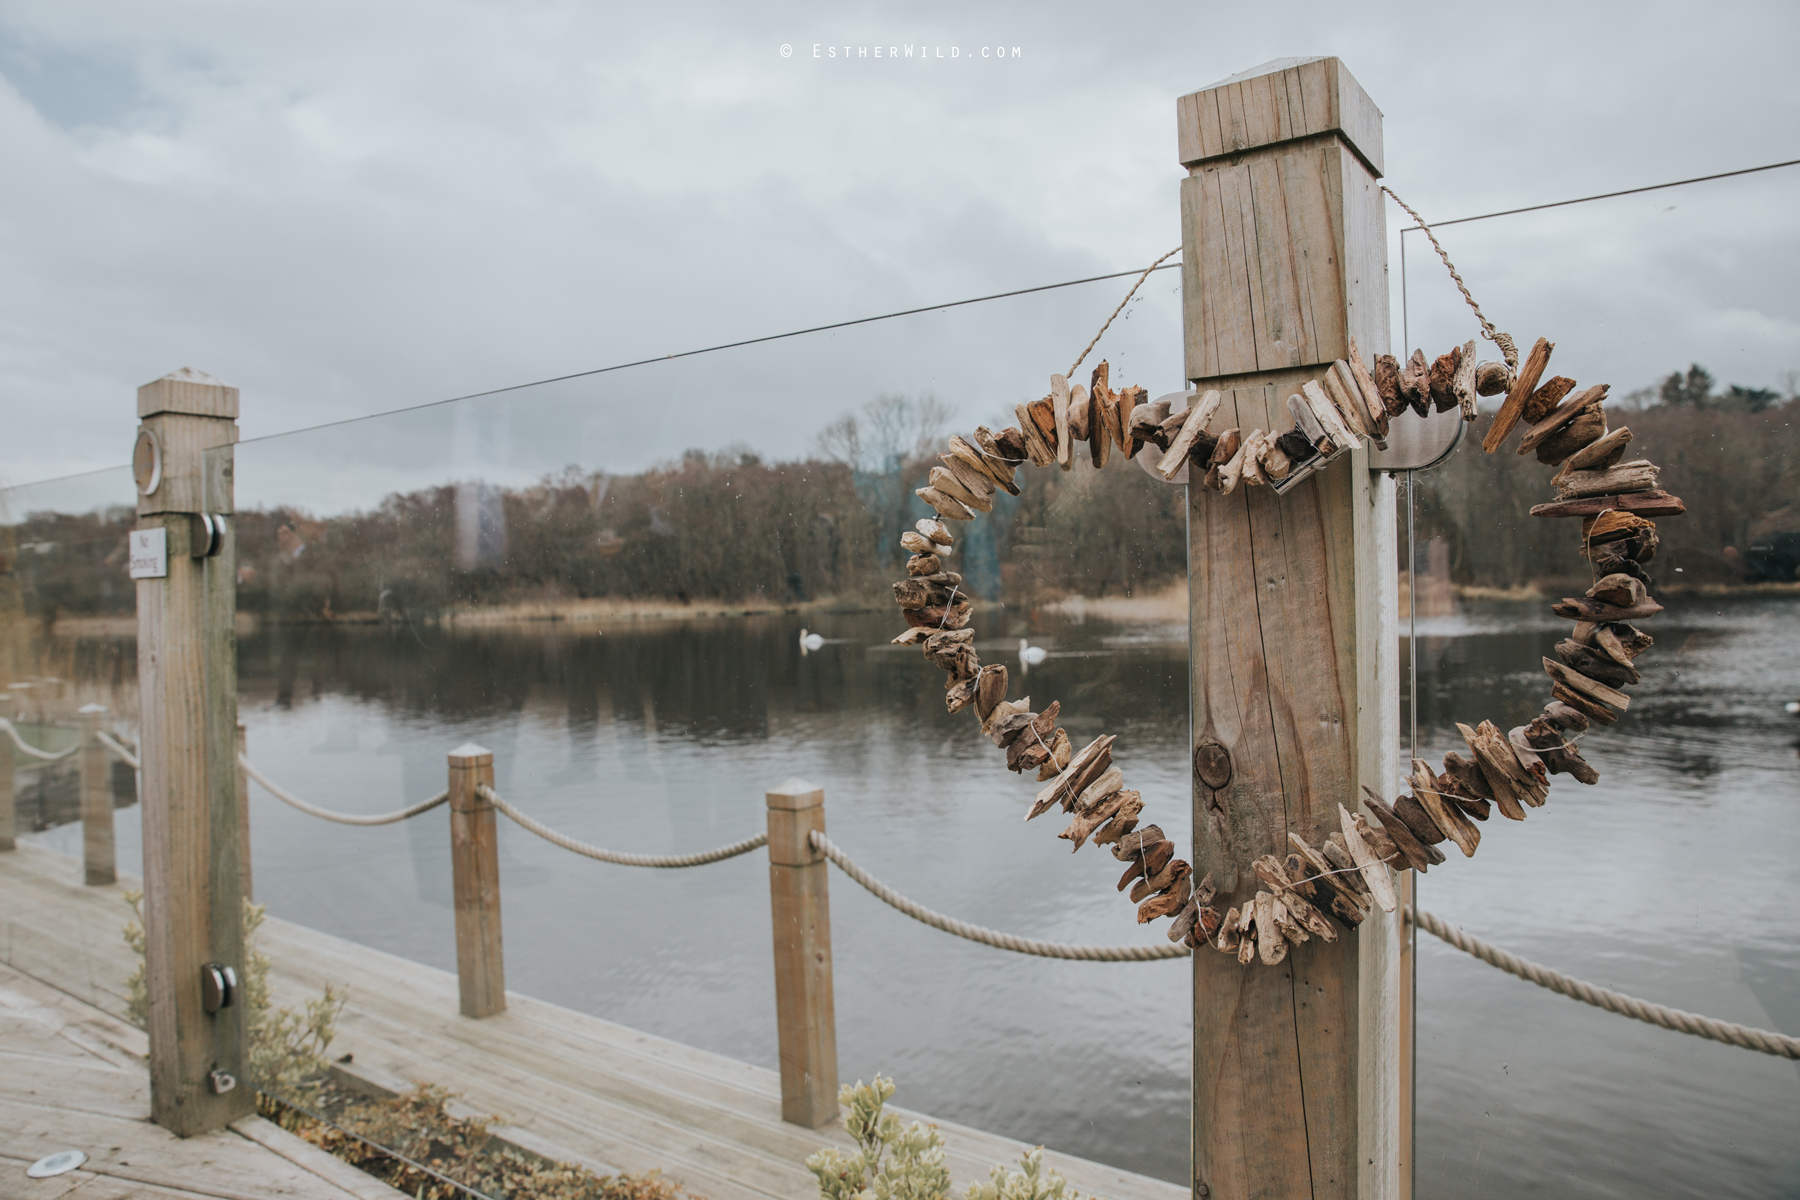 The_BoatHouse_Wedding_Venue_Ormesby_Norfolk_Broads_Boat_Wedding_Photography_Esther_Wild_Photographer_IMG_0892.jpg